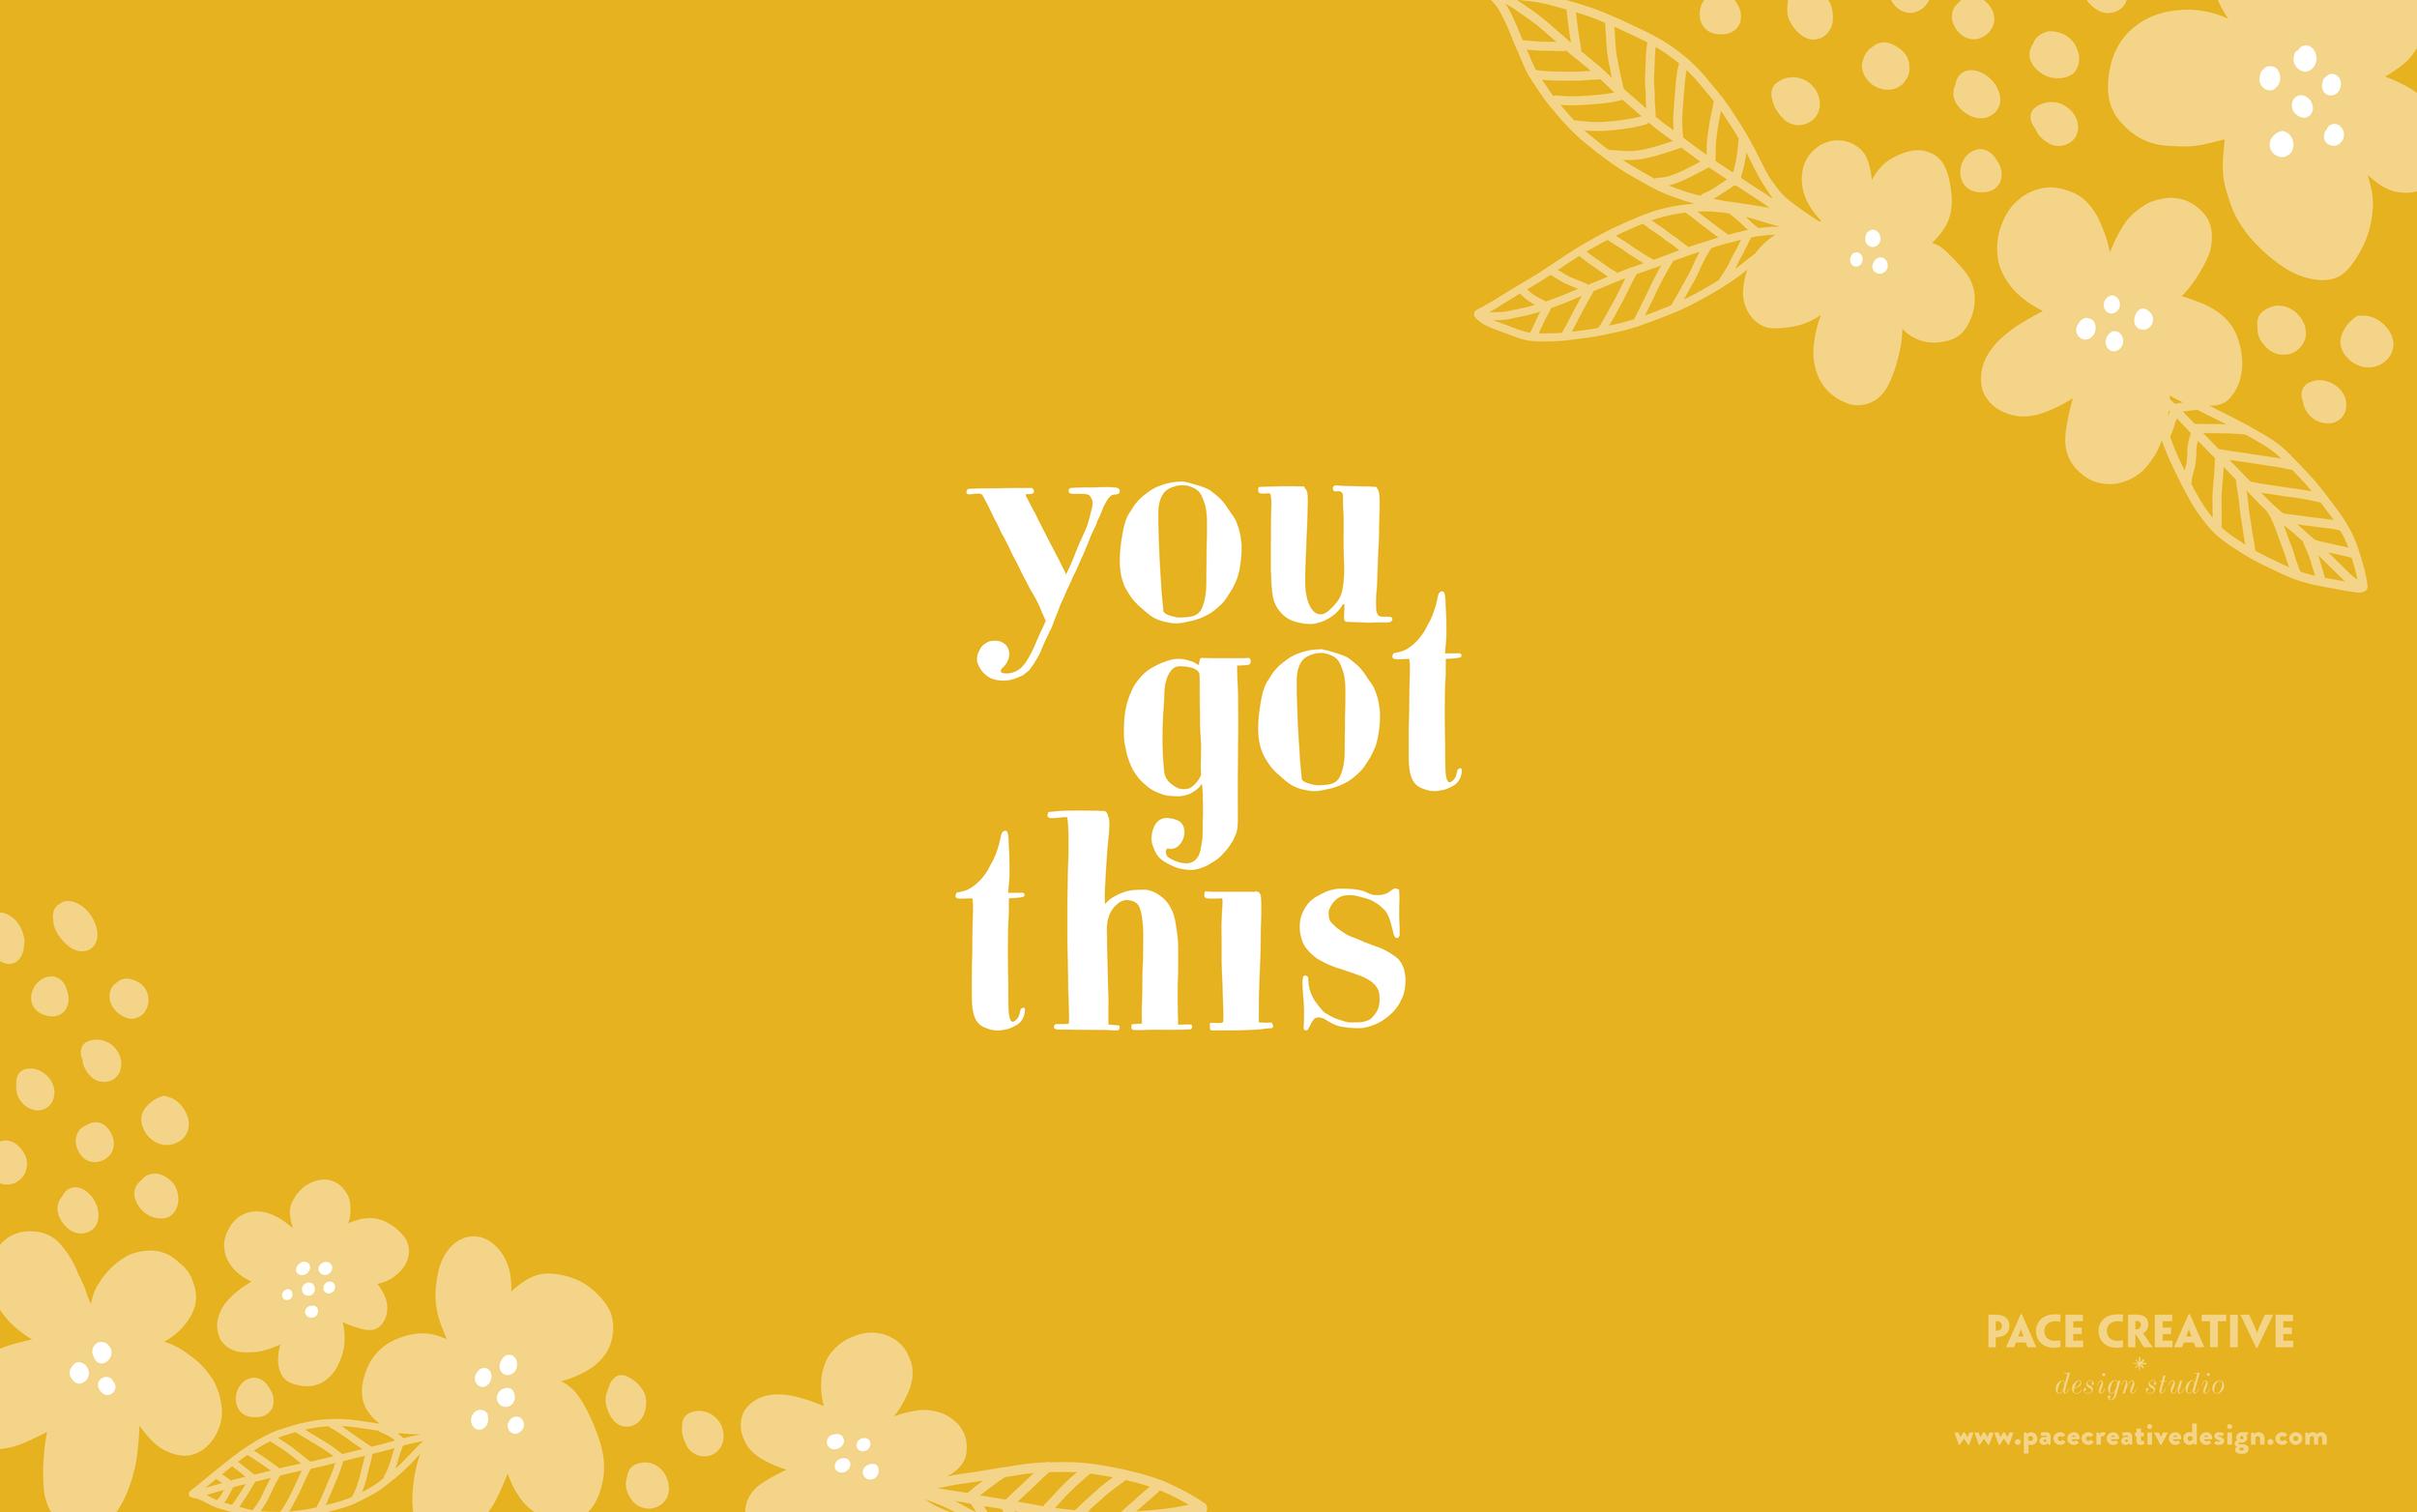 You Got This | Free Desktop Wallpaper design by Pace Creative Design Studio